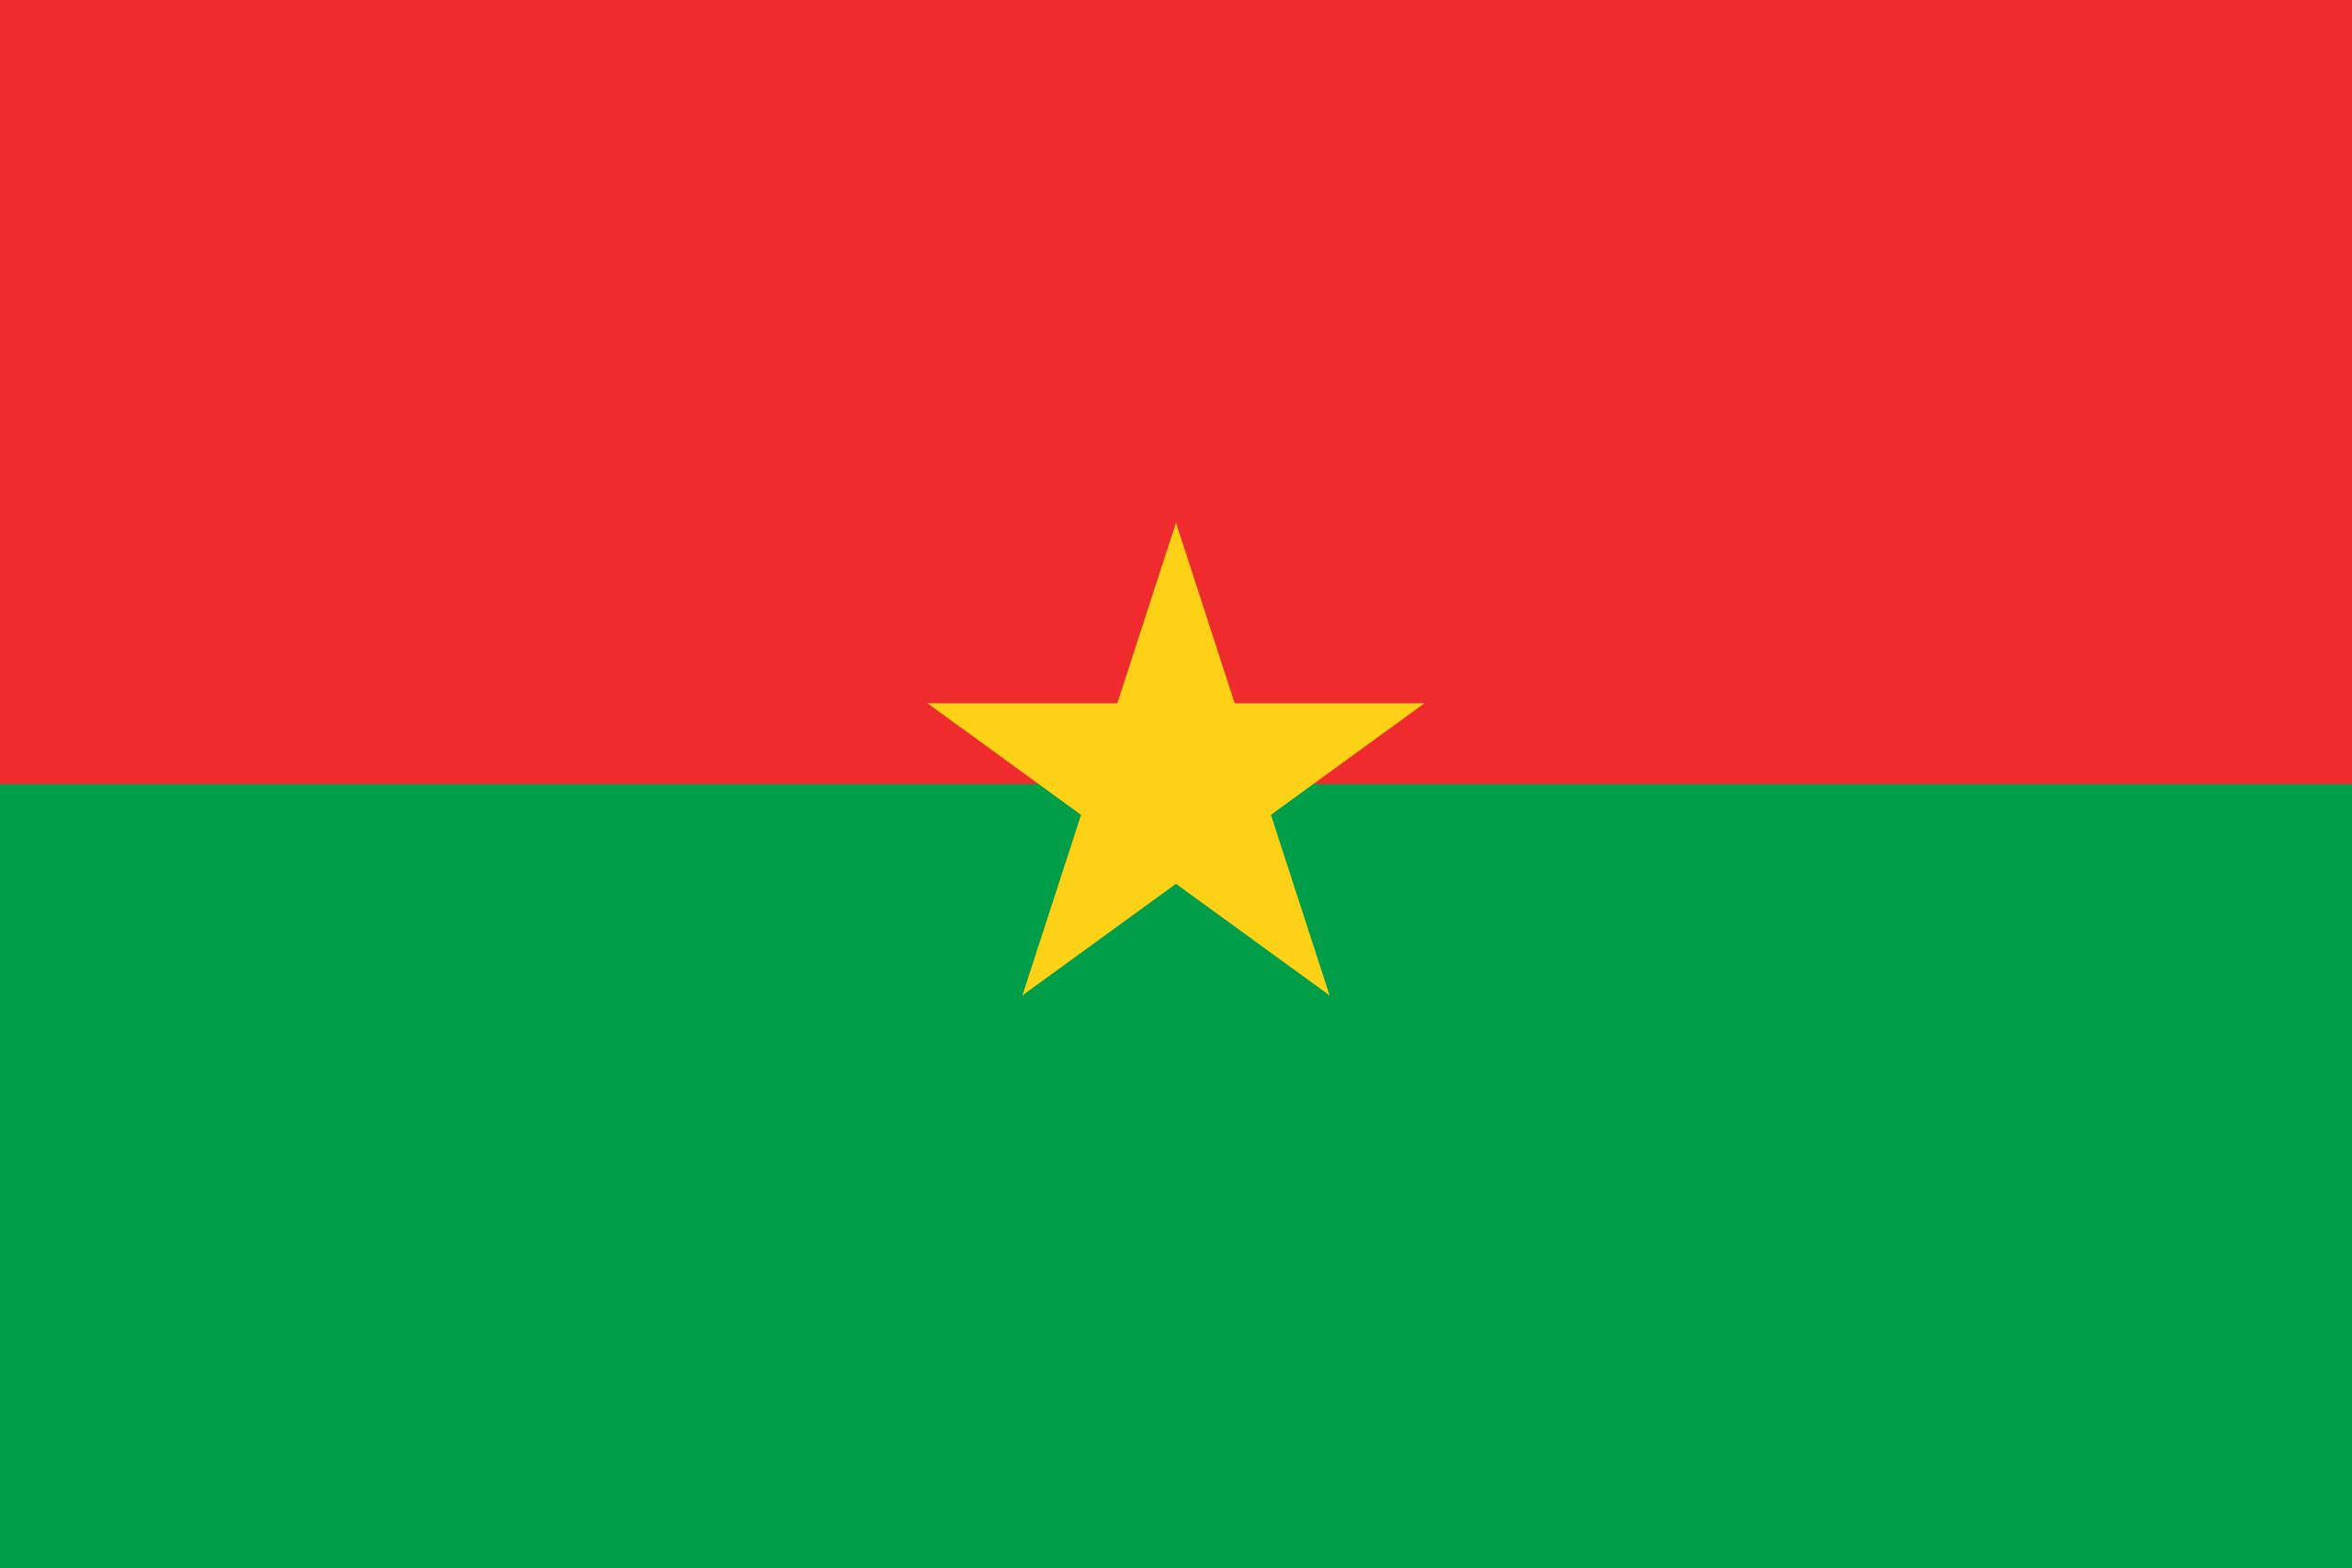 burkina faso, страна, Эмблема, логотип, символ - Обои HD - Профессор falken.com